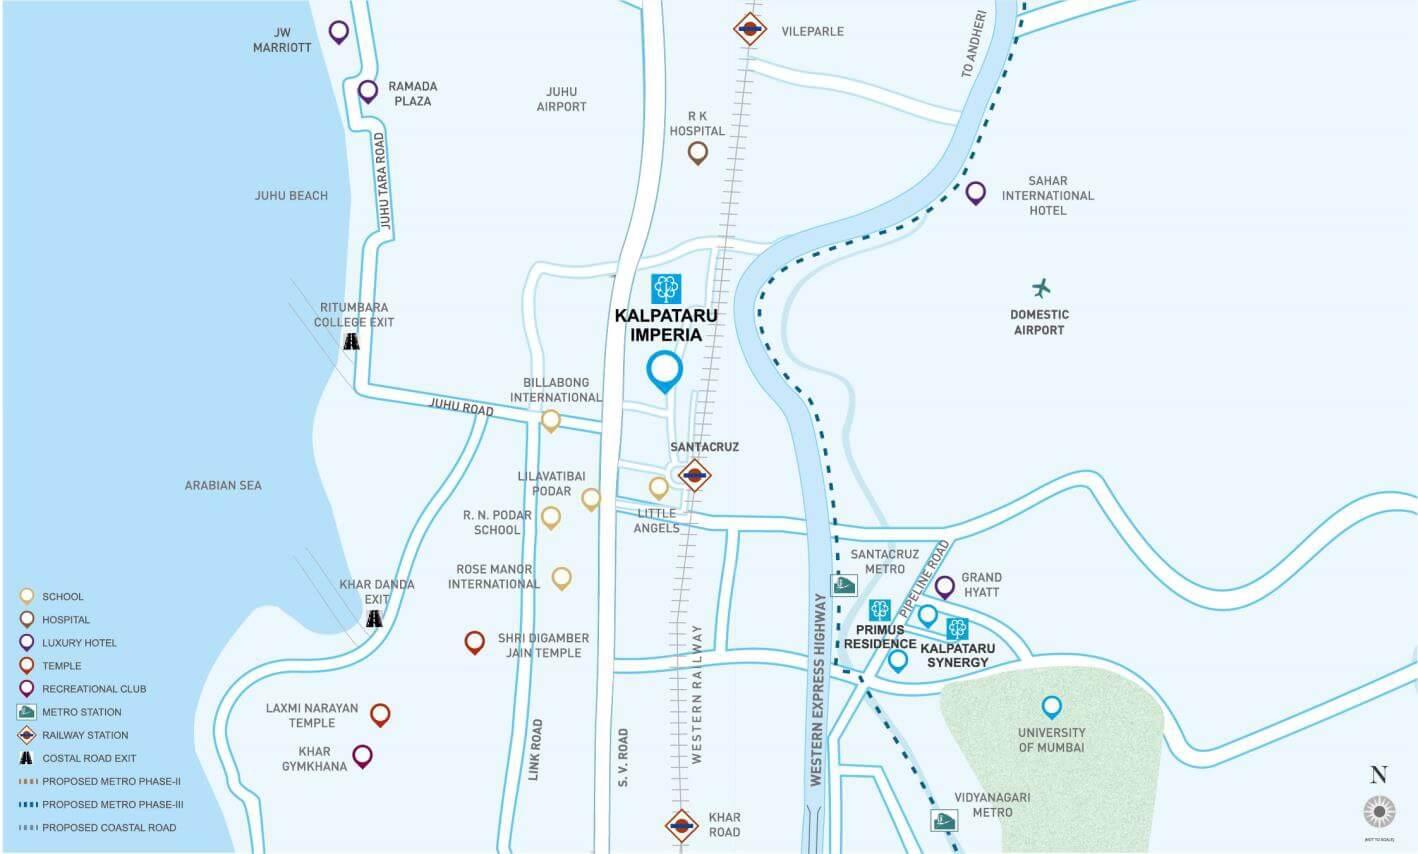 kalpataru imperia location image1